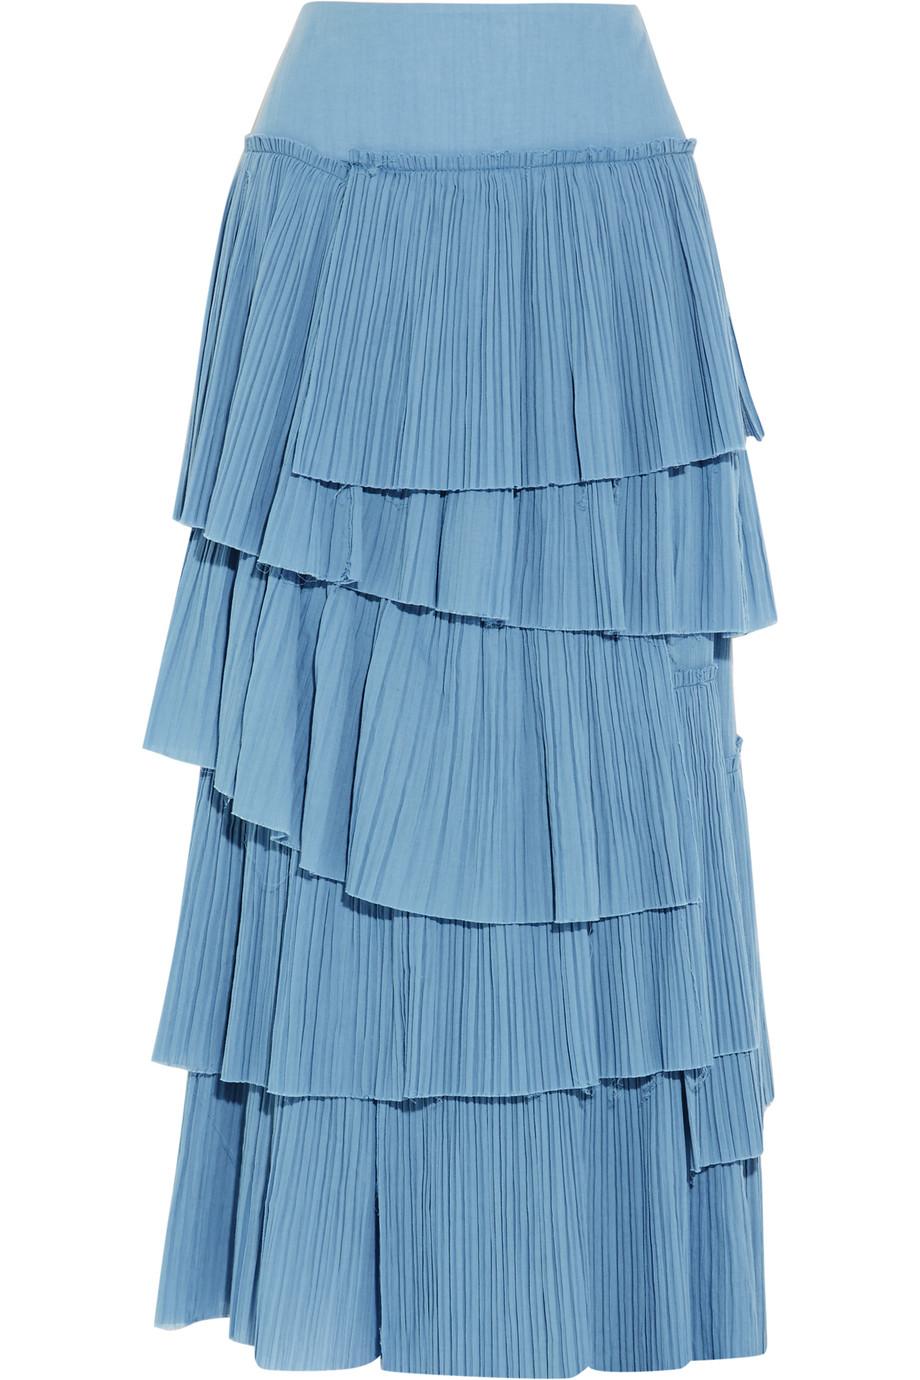 Sonia Rykiel Tiered Plissé-Cotton Maxi Skirt, Blue, Women's, Size: 36